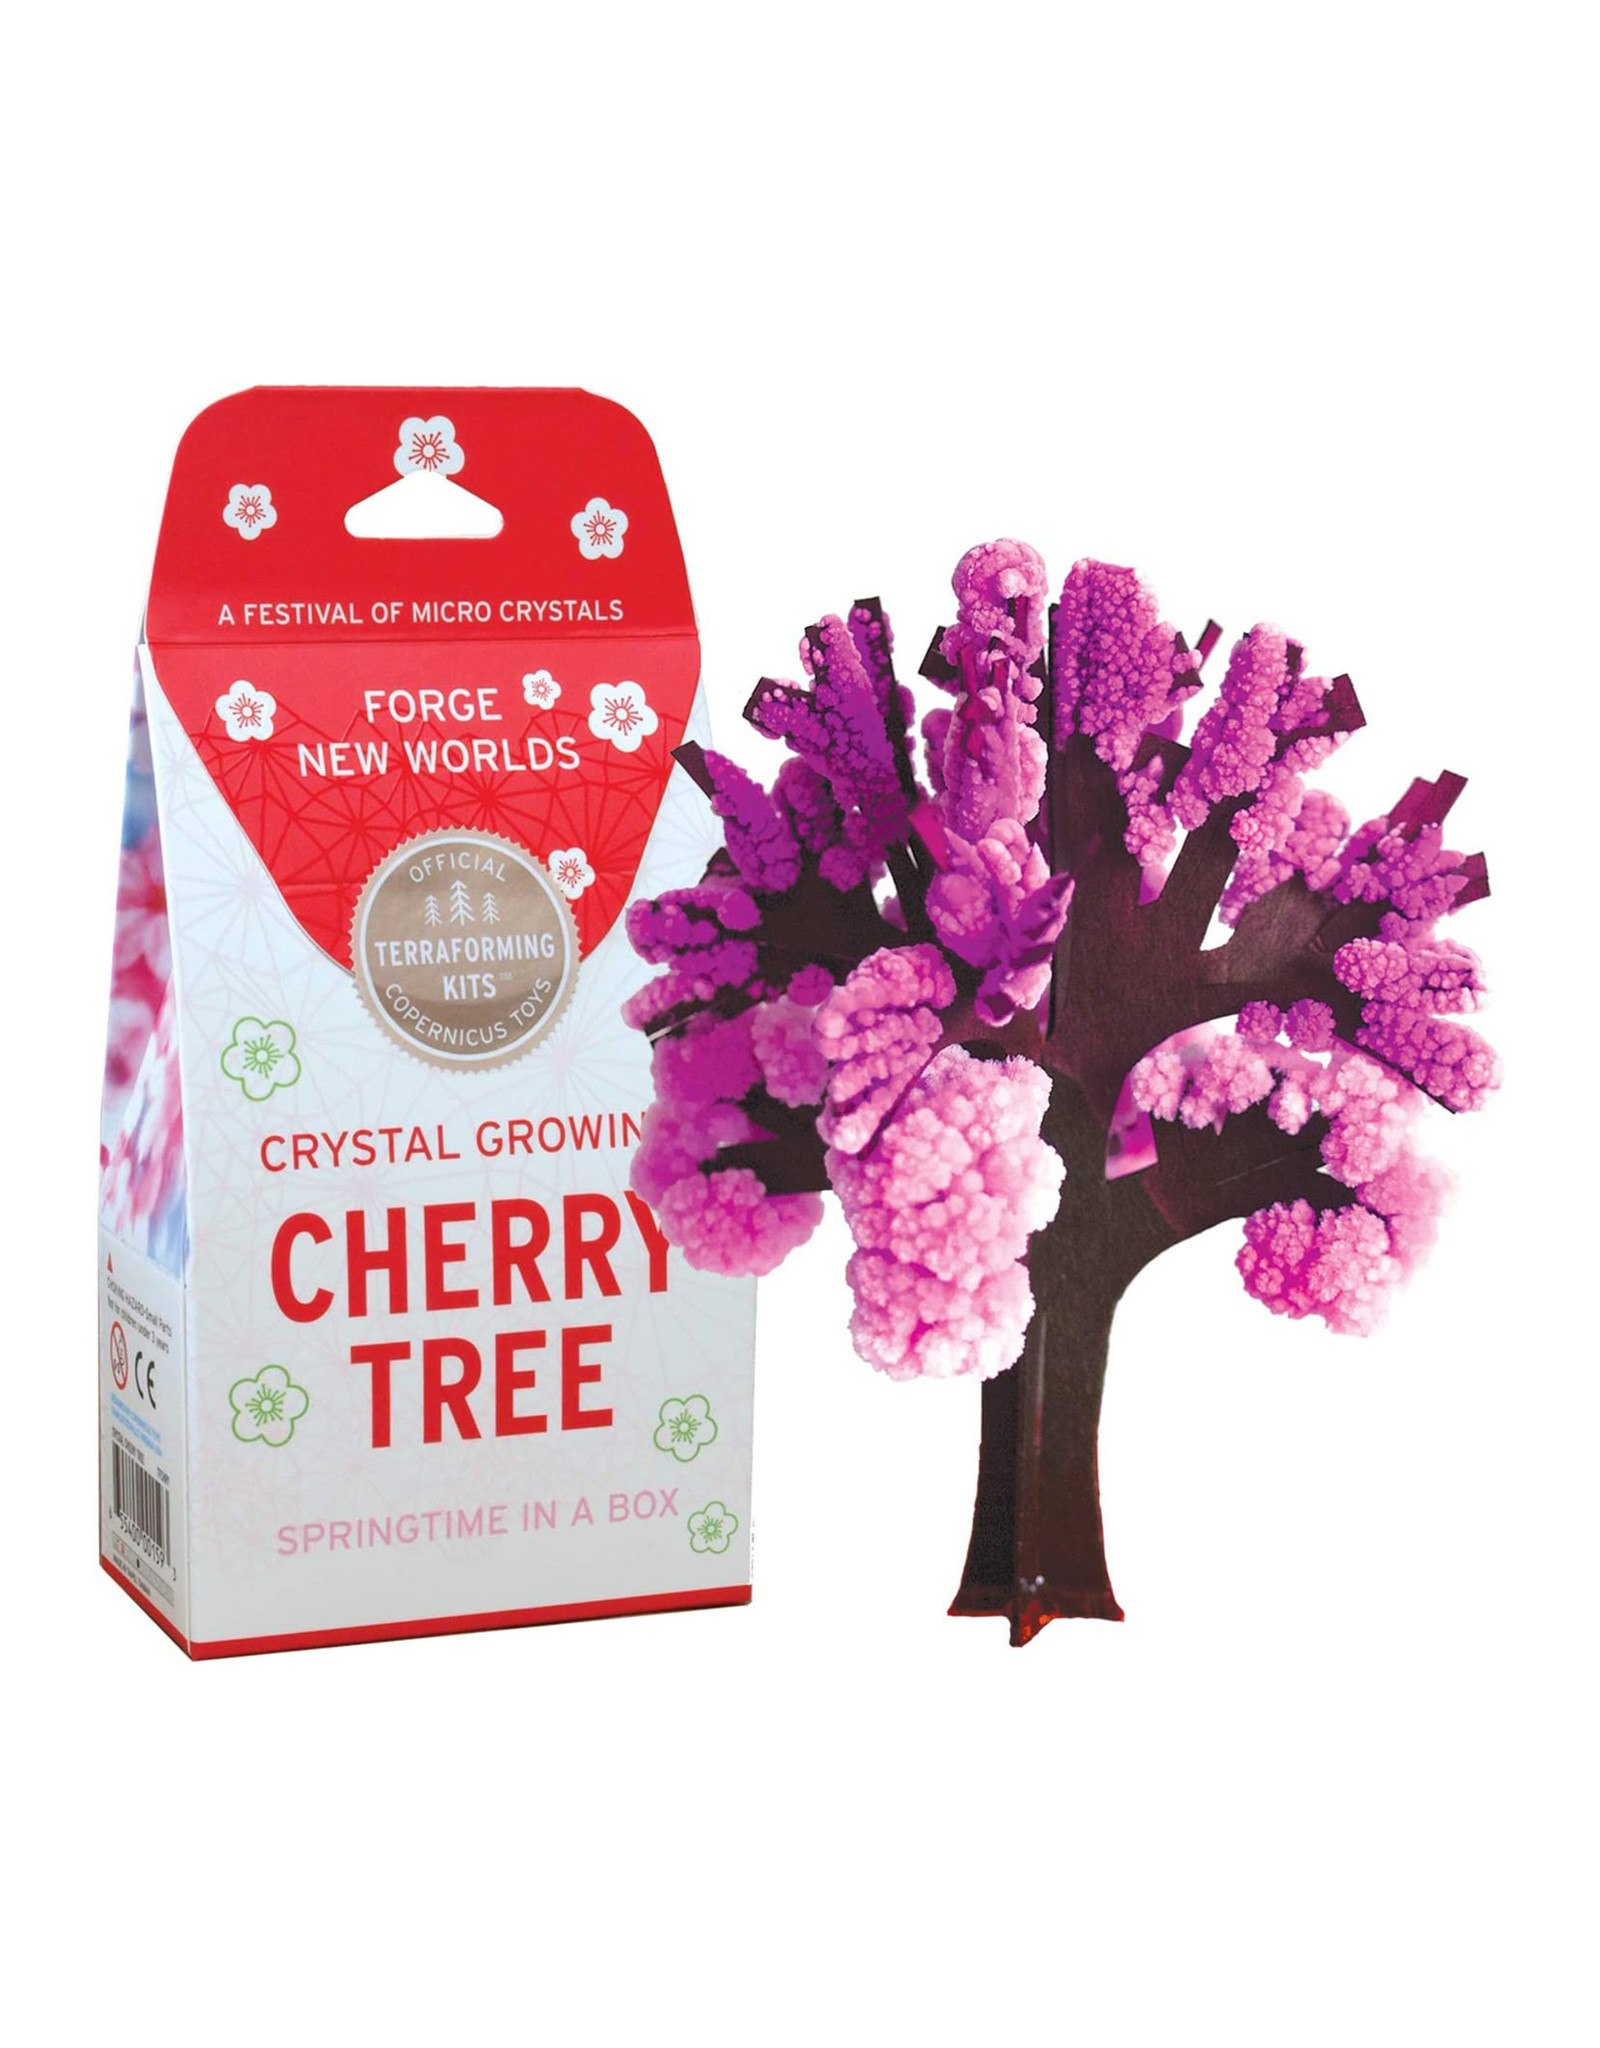 Crystal Growing: Cherry Tree